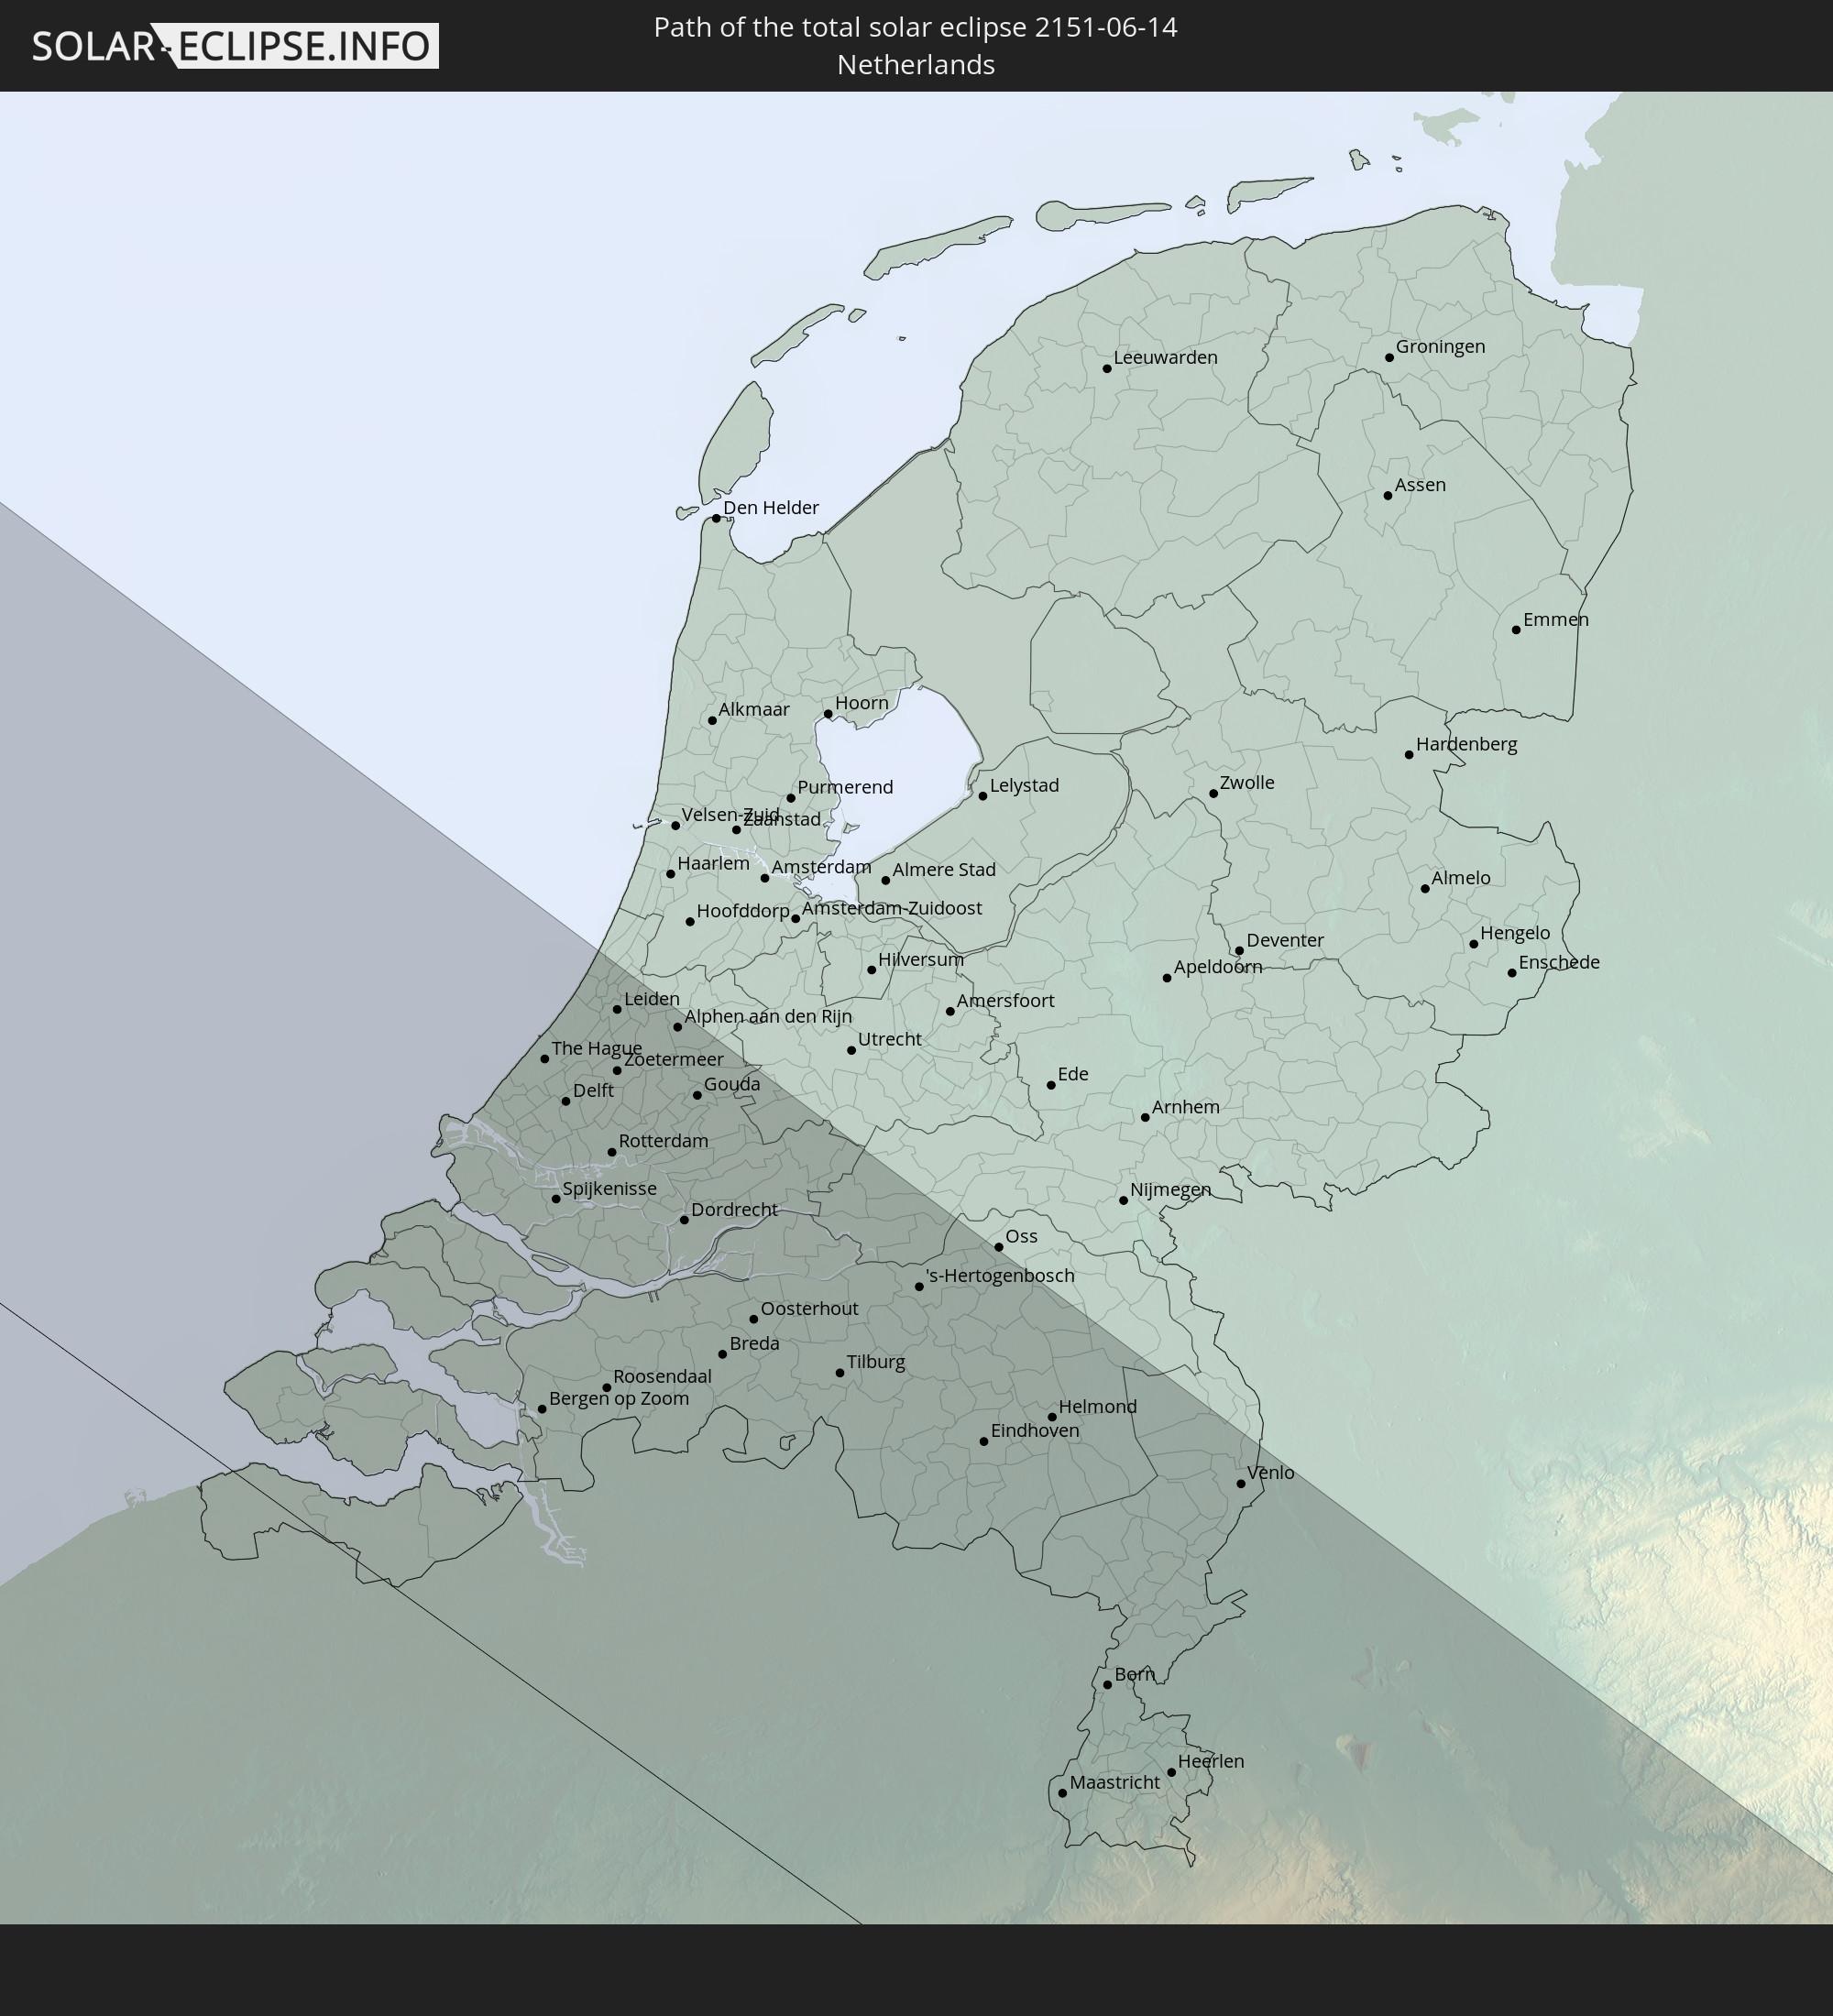 Netherlands Map Of Country%0A Netherlands On The World Map Netherlands On The World Map worldmap  Netherlands worldmap